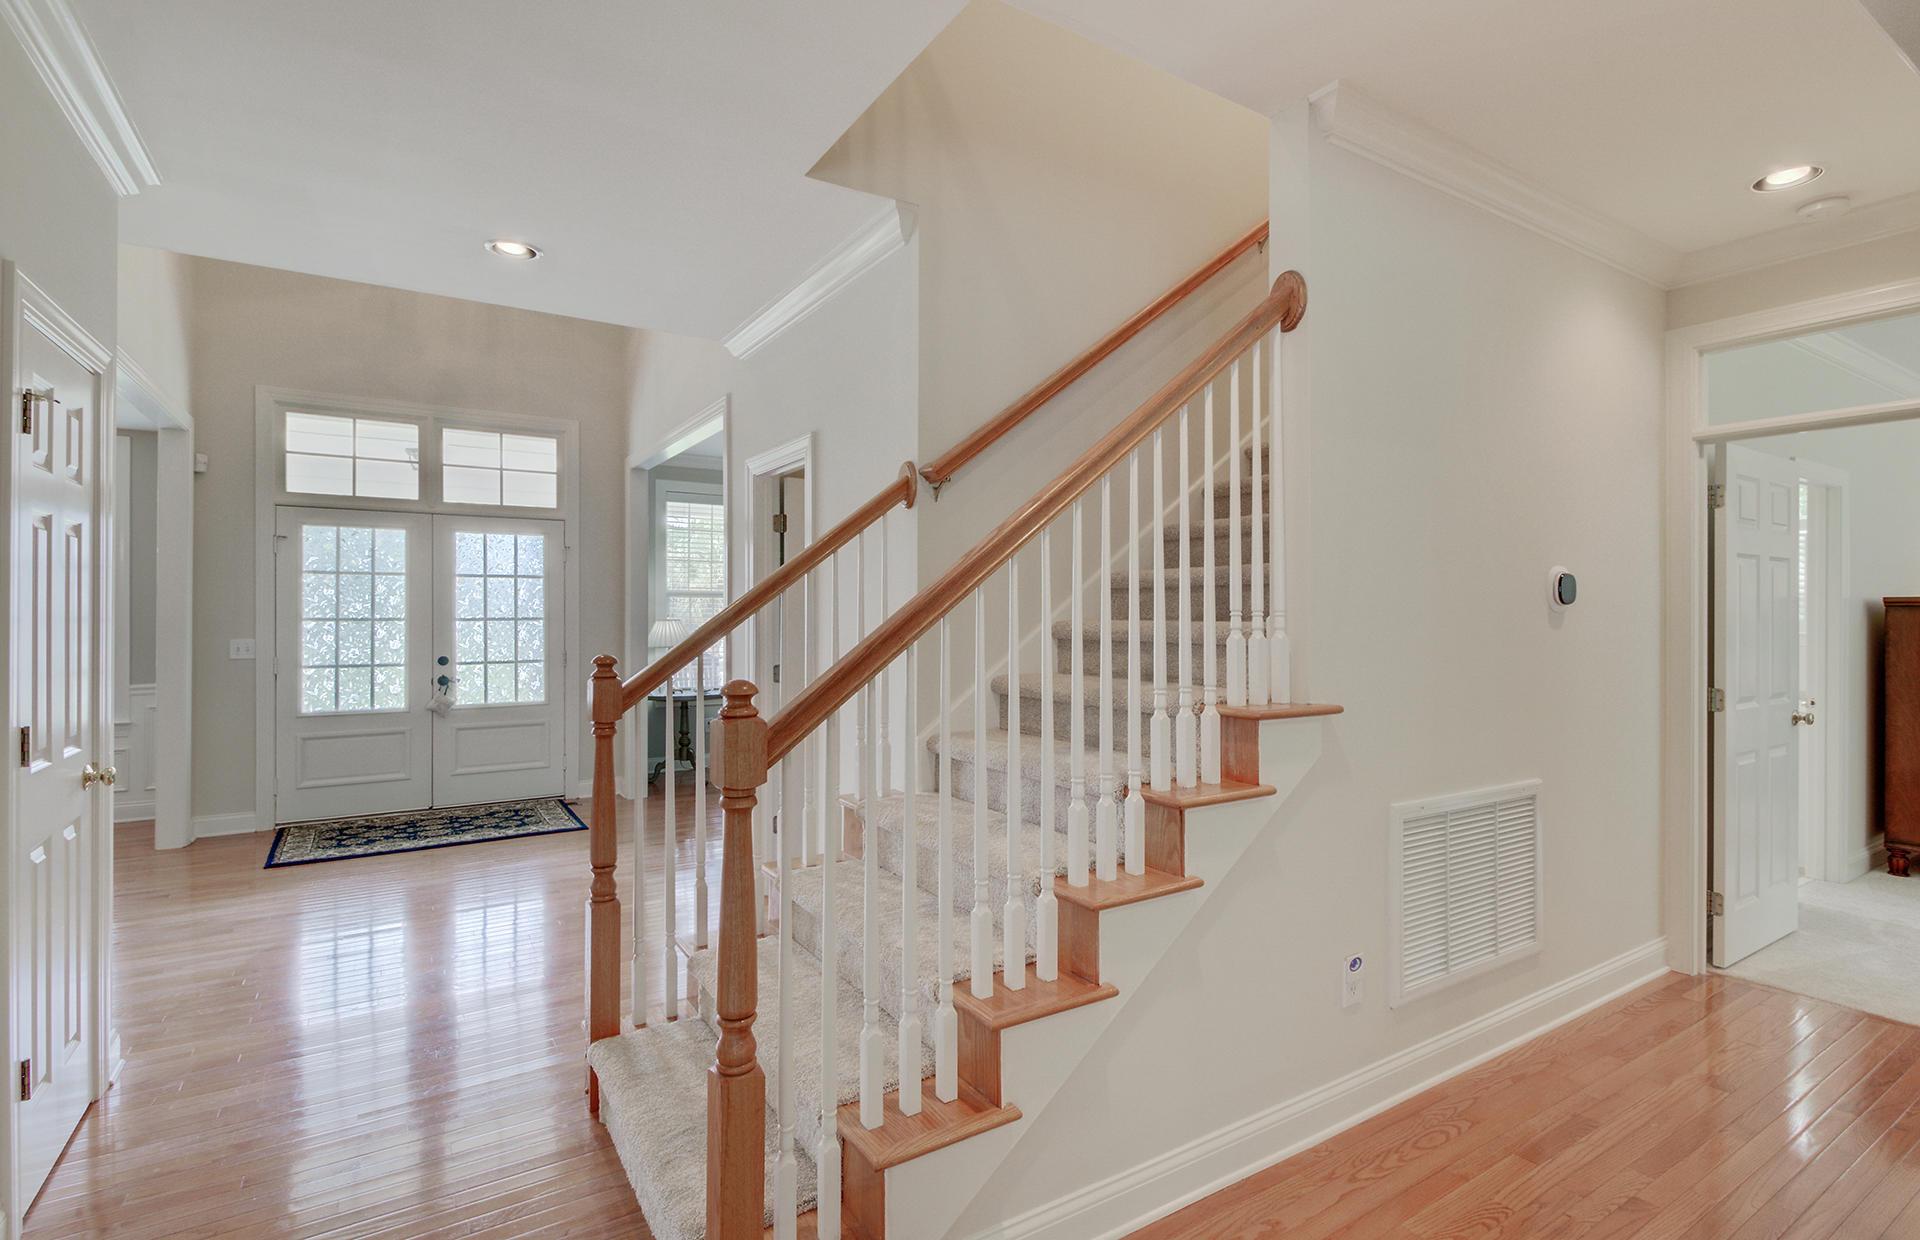 Dunes West Homes For Sale - 2453 Darts Cove, Mount Pleasant, SC - 5